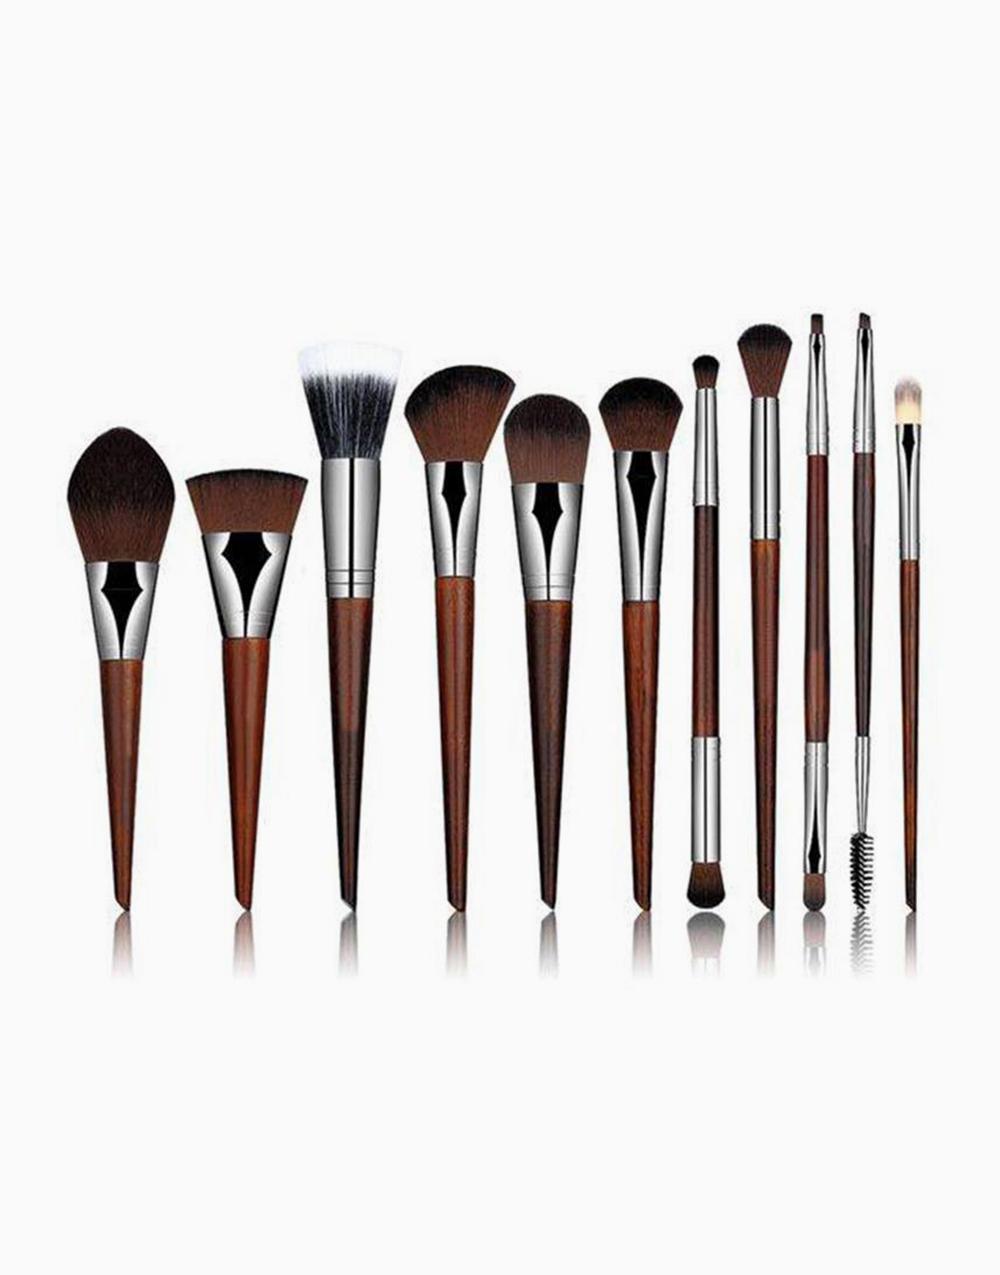 11-Piece Rosewood Makeup Brush Set by Brush Works